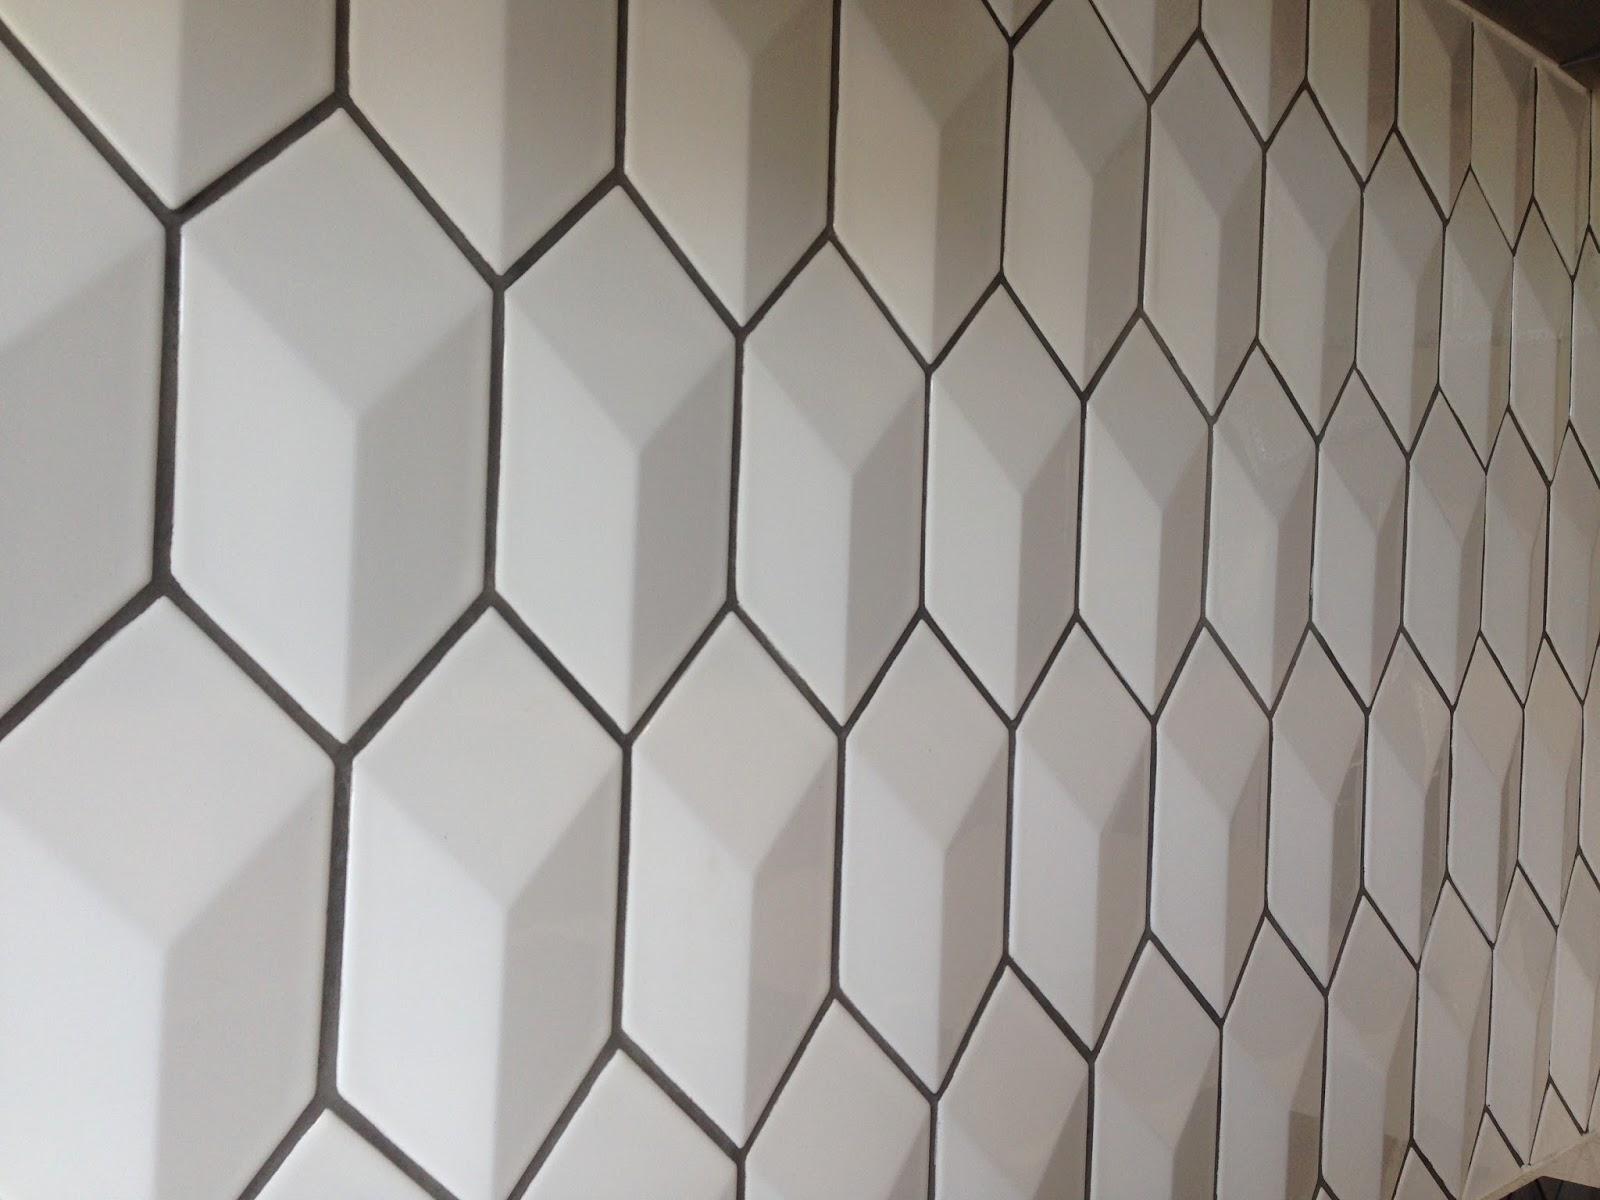 Mrs Cake: A geometric tiled backsplash